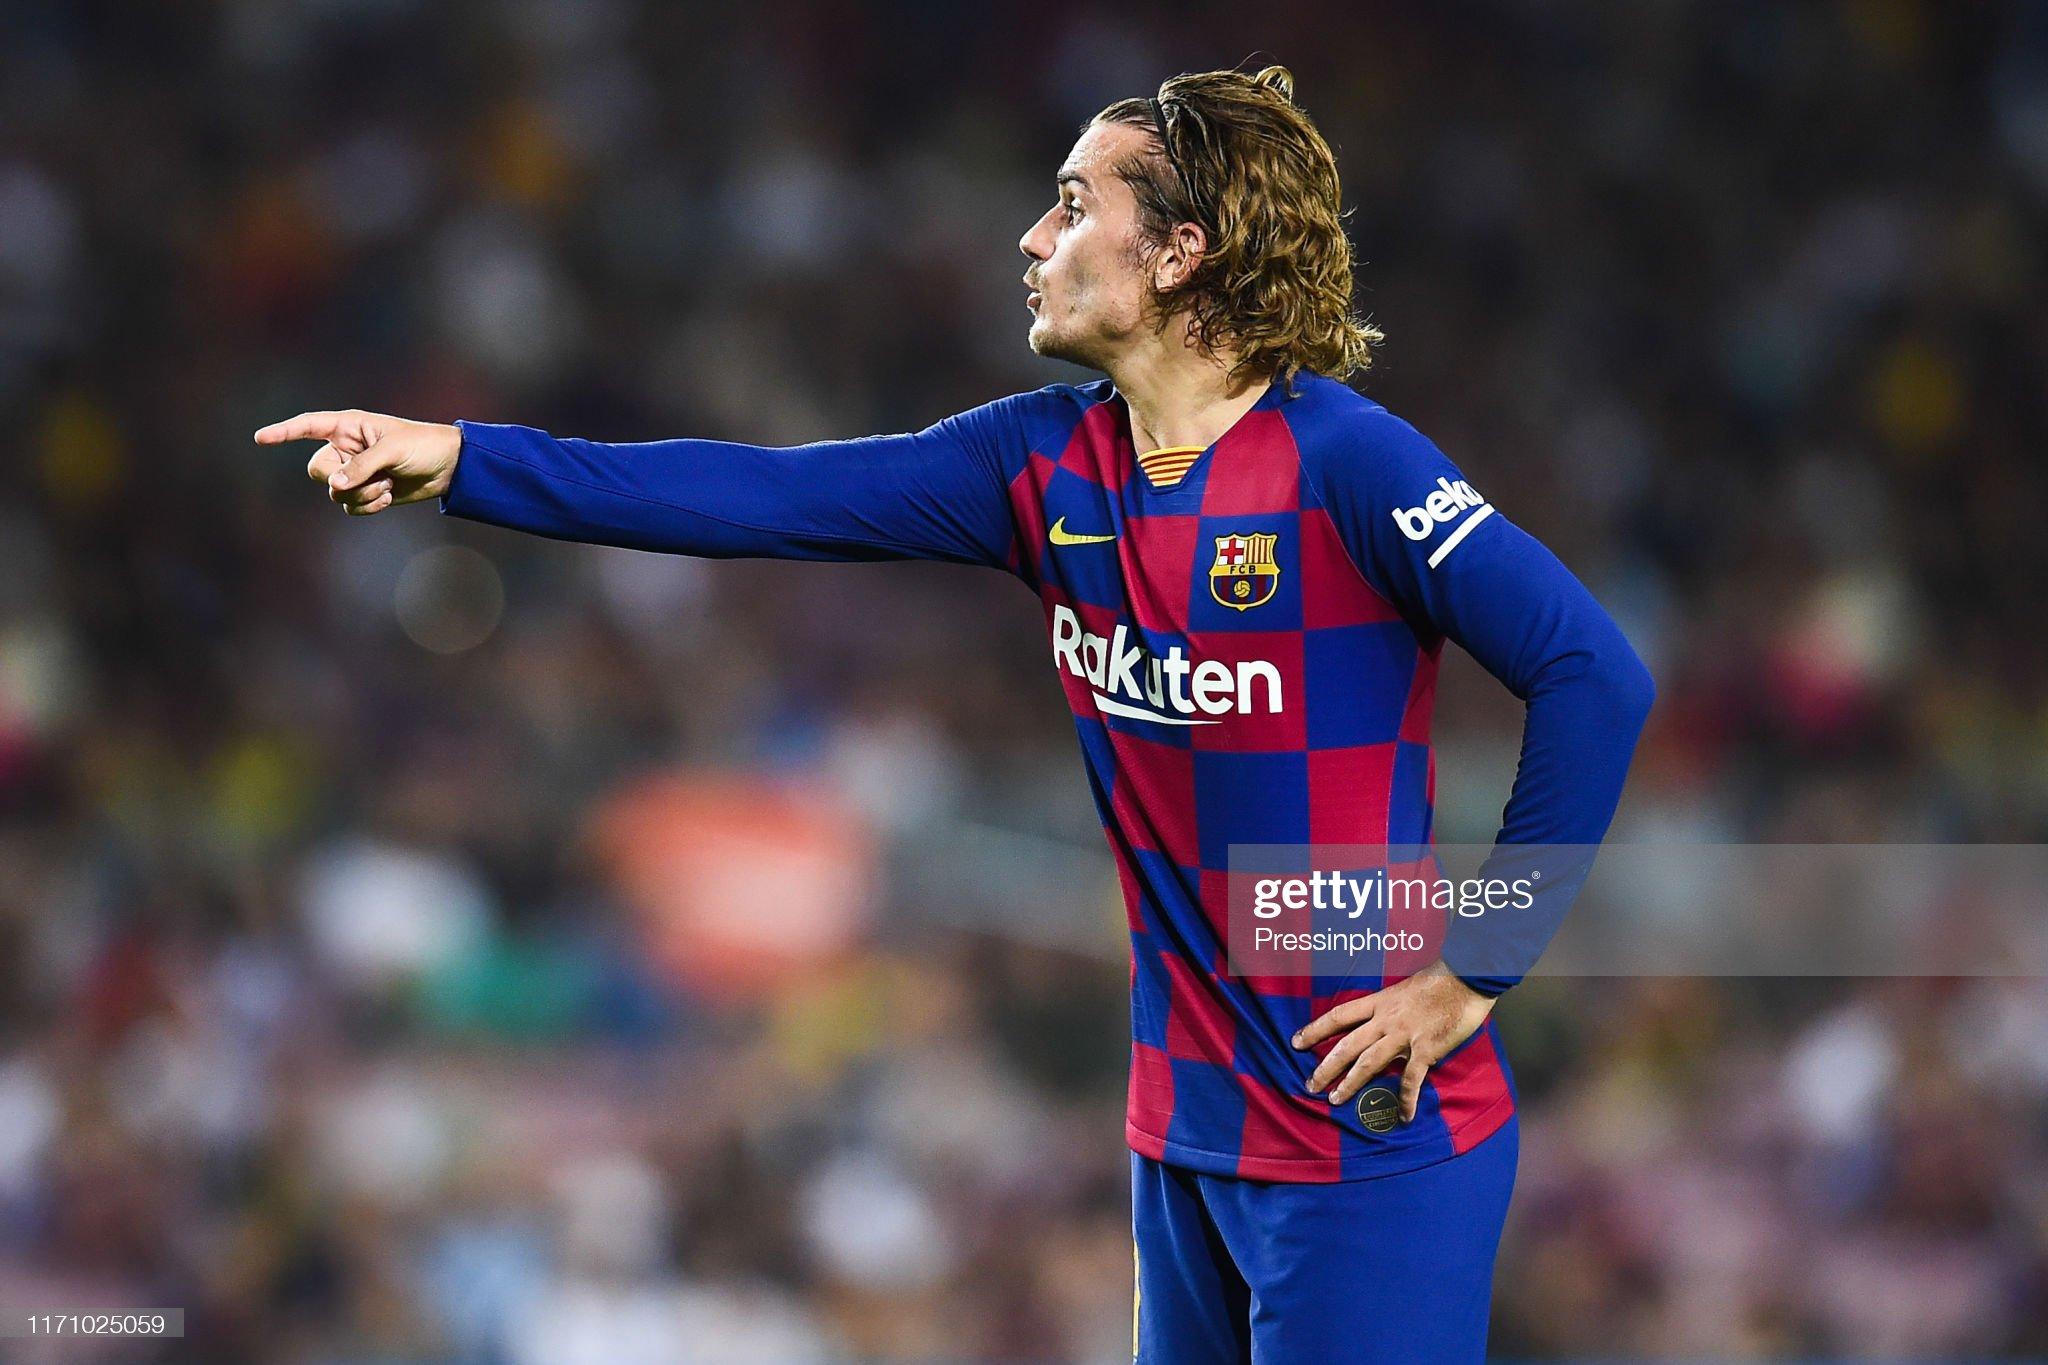 صور مباراة : برشلونة - فياريال 2-1 ( 24-09-2019 )  Antoine-griezmann-of-fc-barcelona-during-the-liga-match-between-and-picture-id1171025059?s=2048x2048